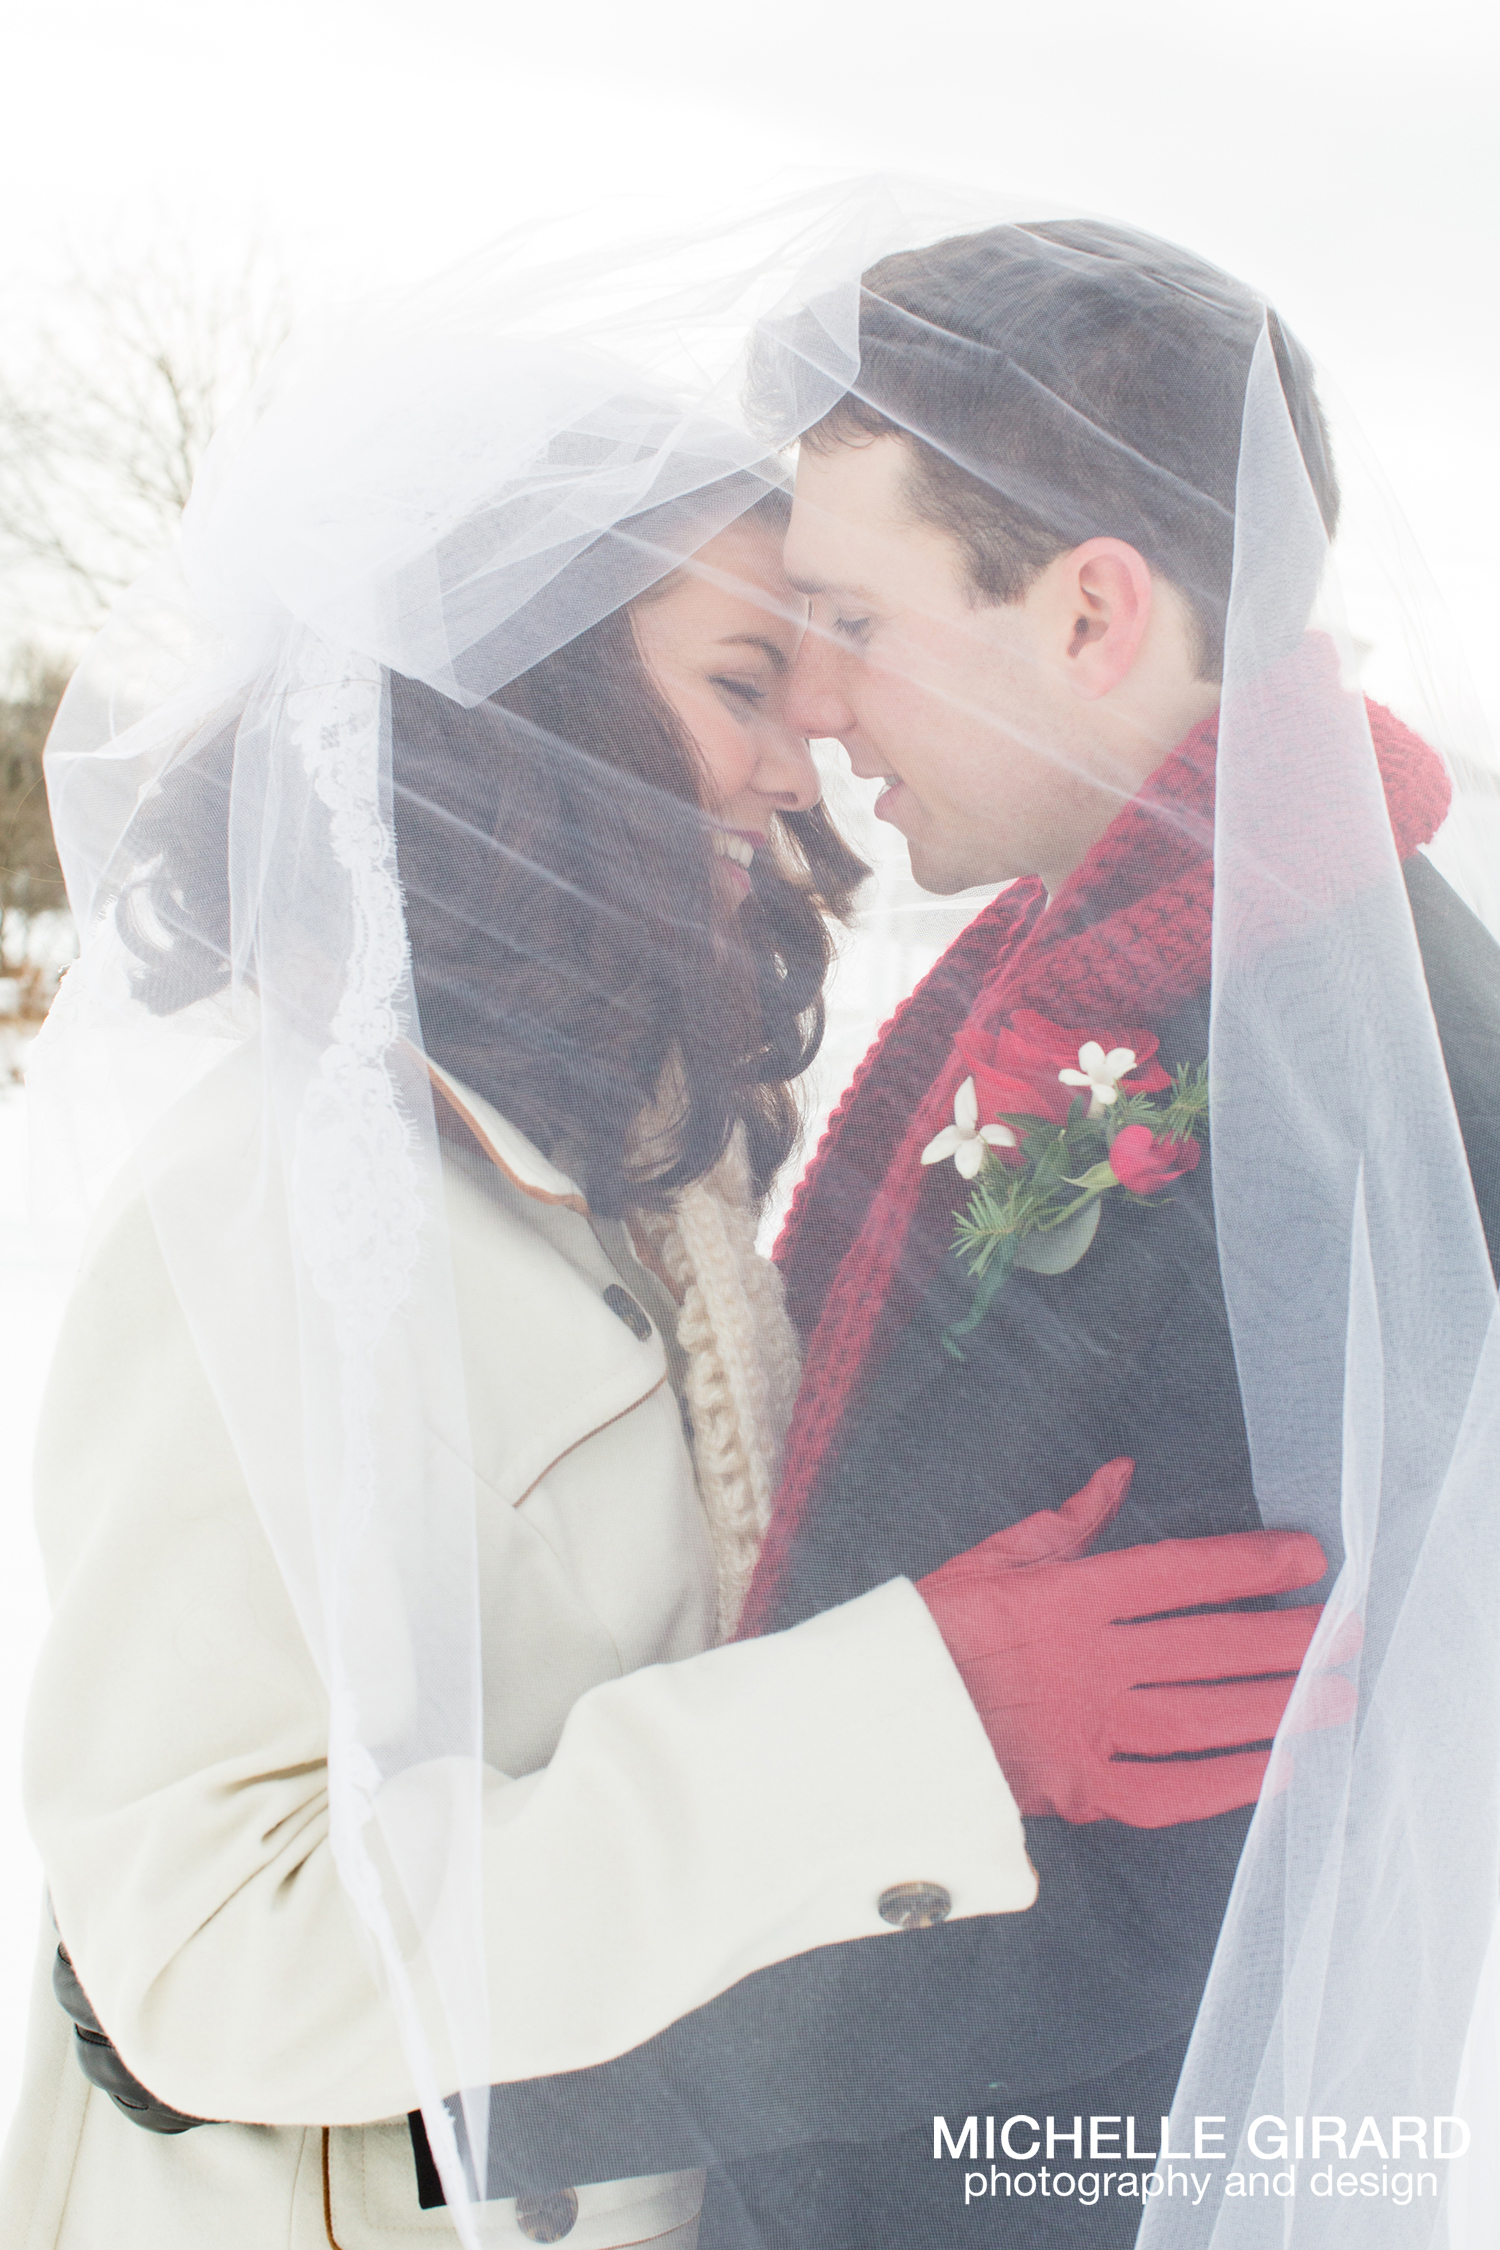 WinterWedding_SalemCrossInn_MichelleGirardPhotography30.jpg